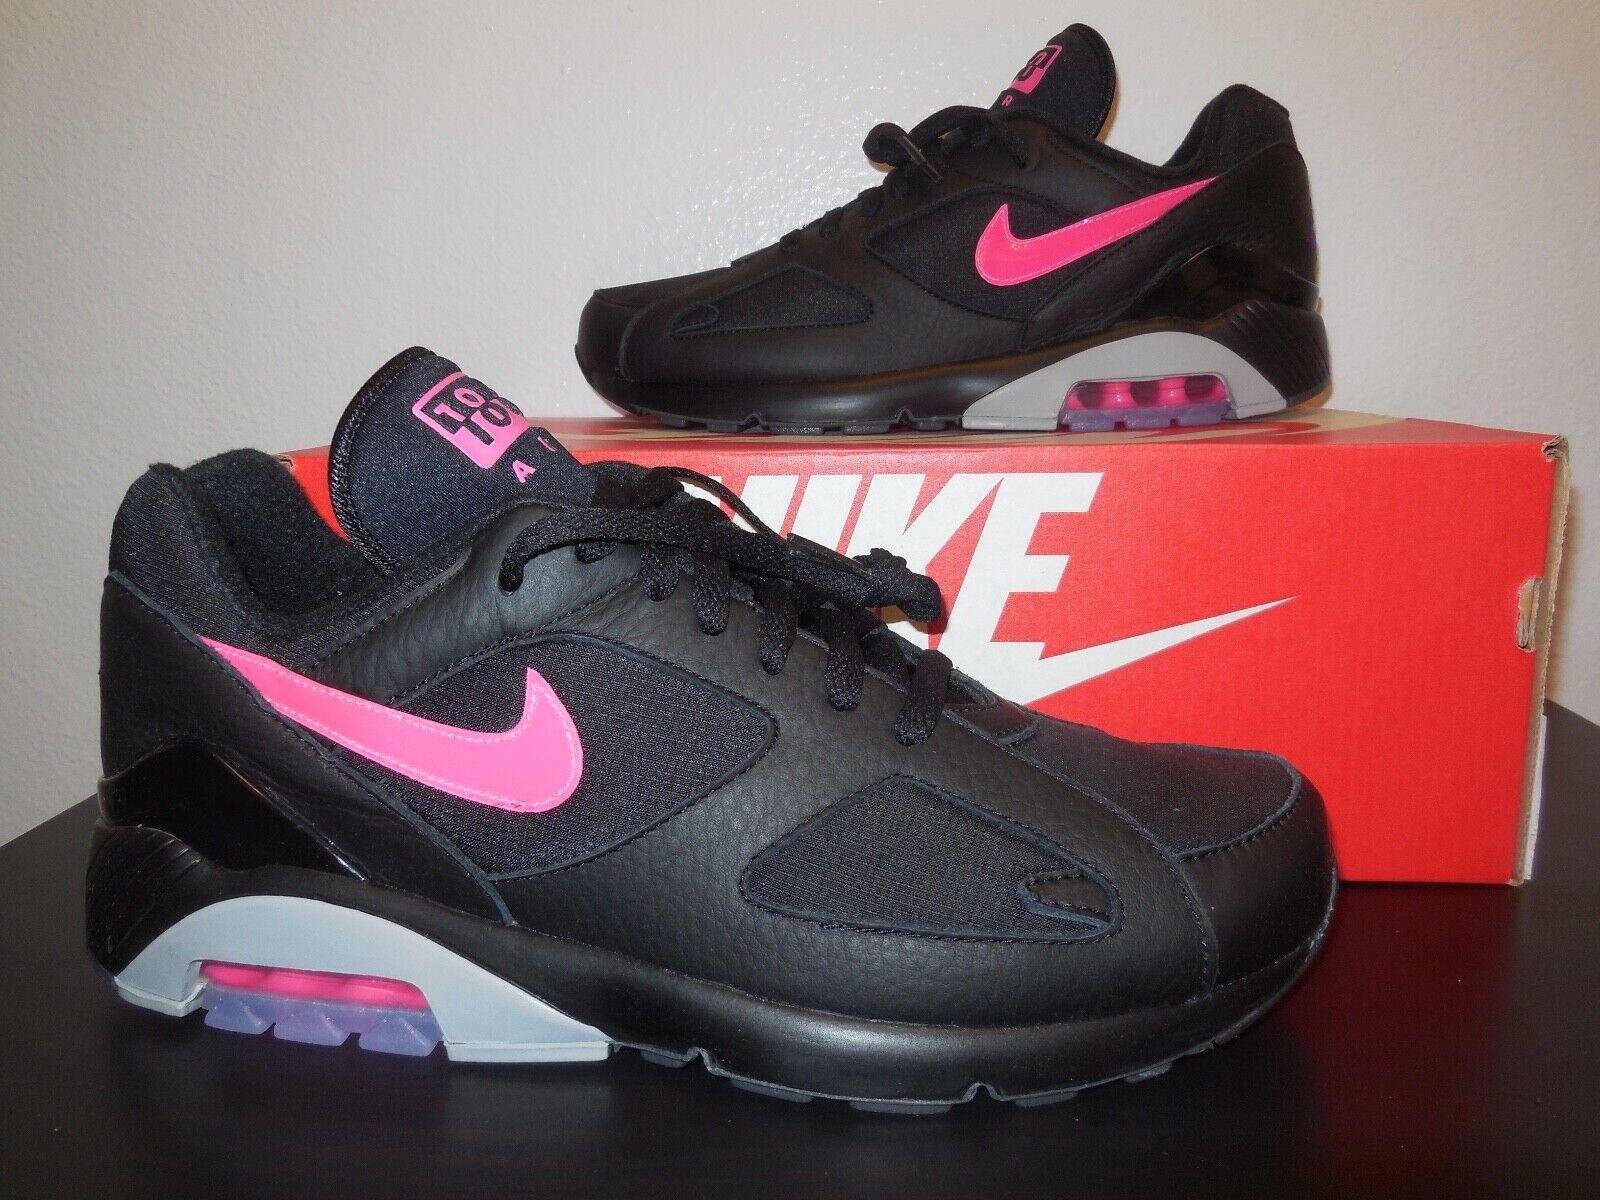 Men's Nike Air Max 180  Black  shoes -StyleAQ9974 001- Reg  140 -Sz 10.5 -NEW